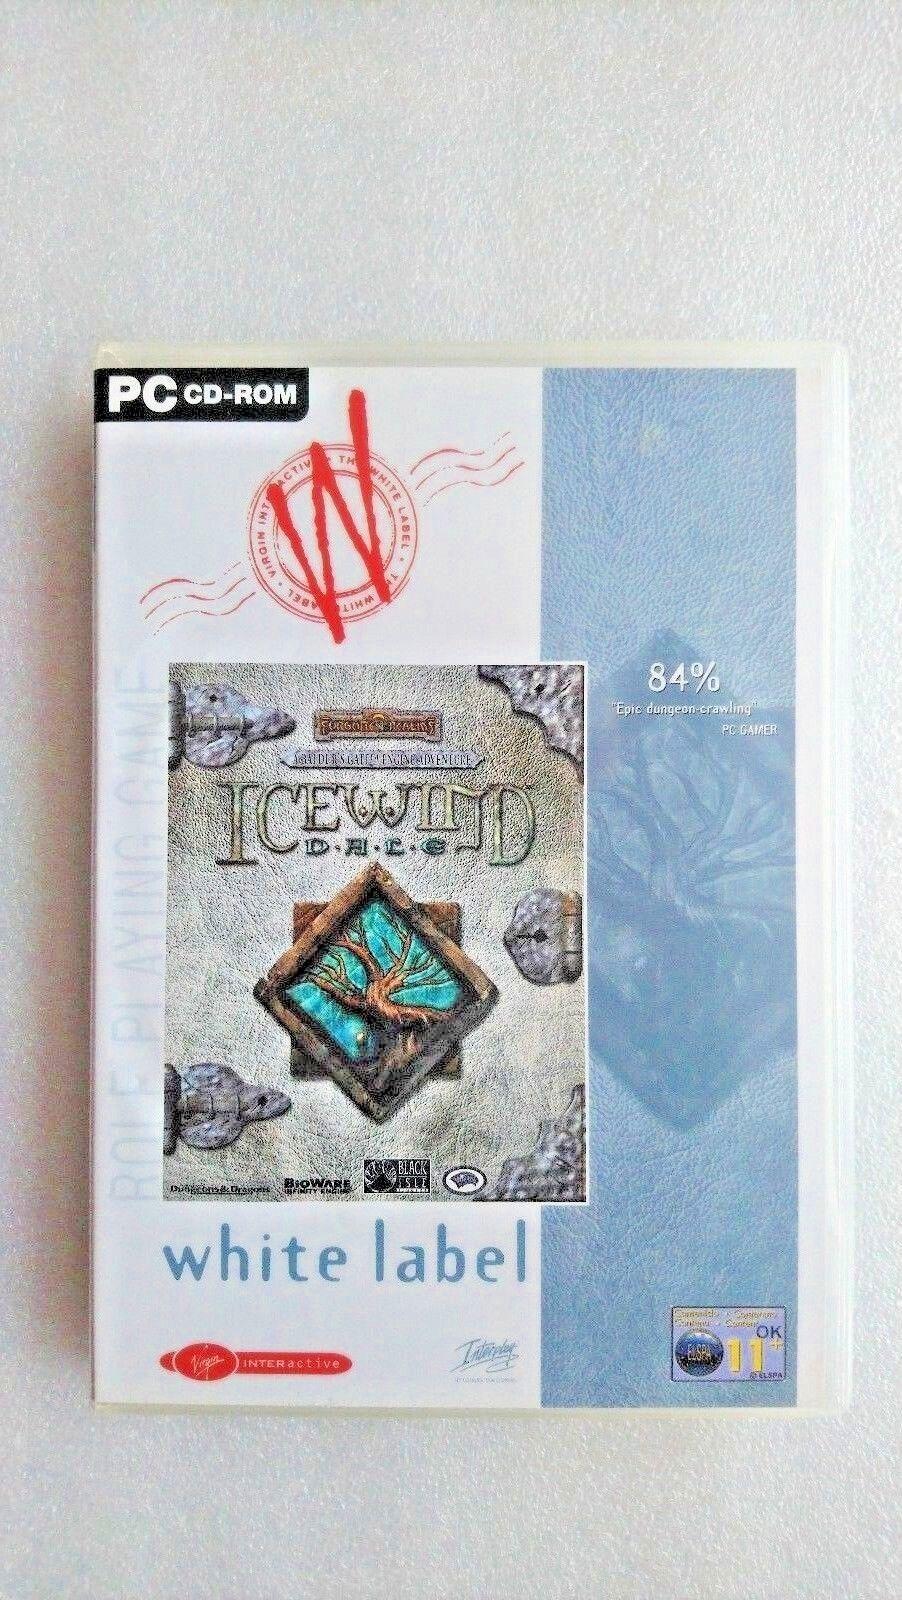 Icewind Dale (PC: Windows 2000)